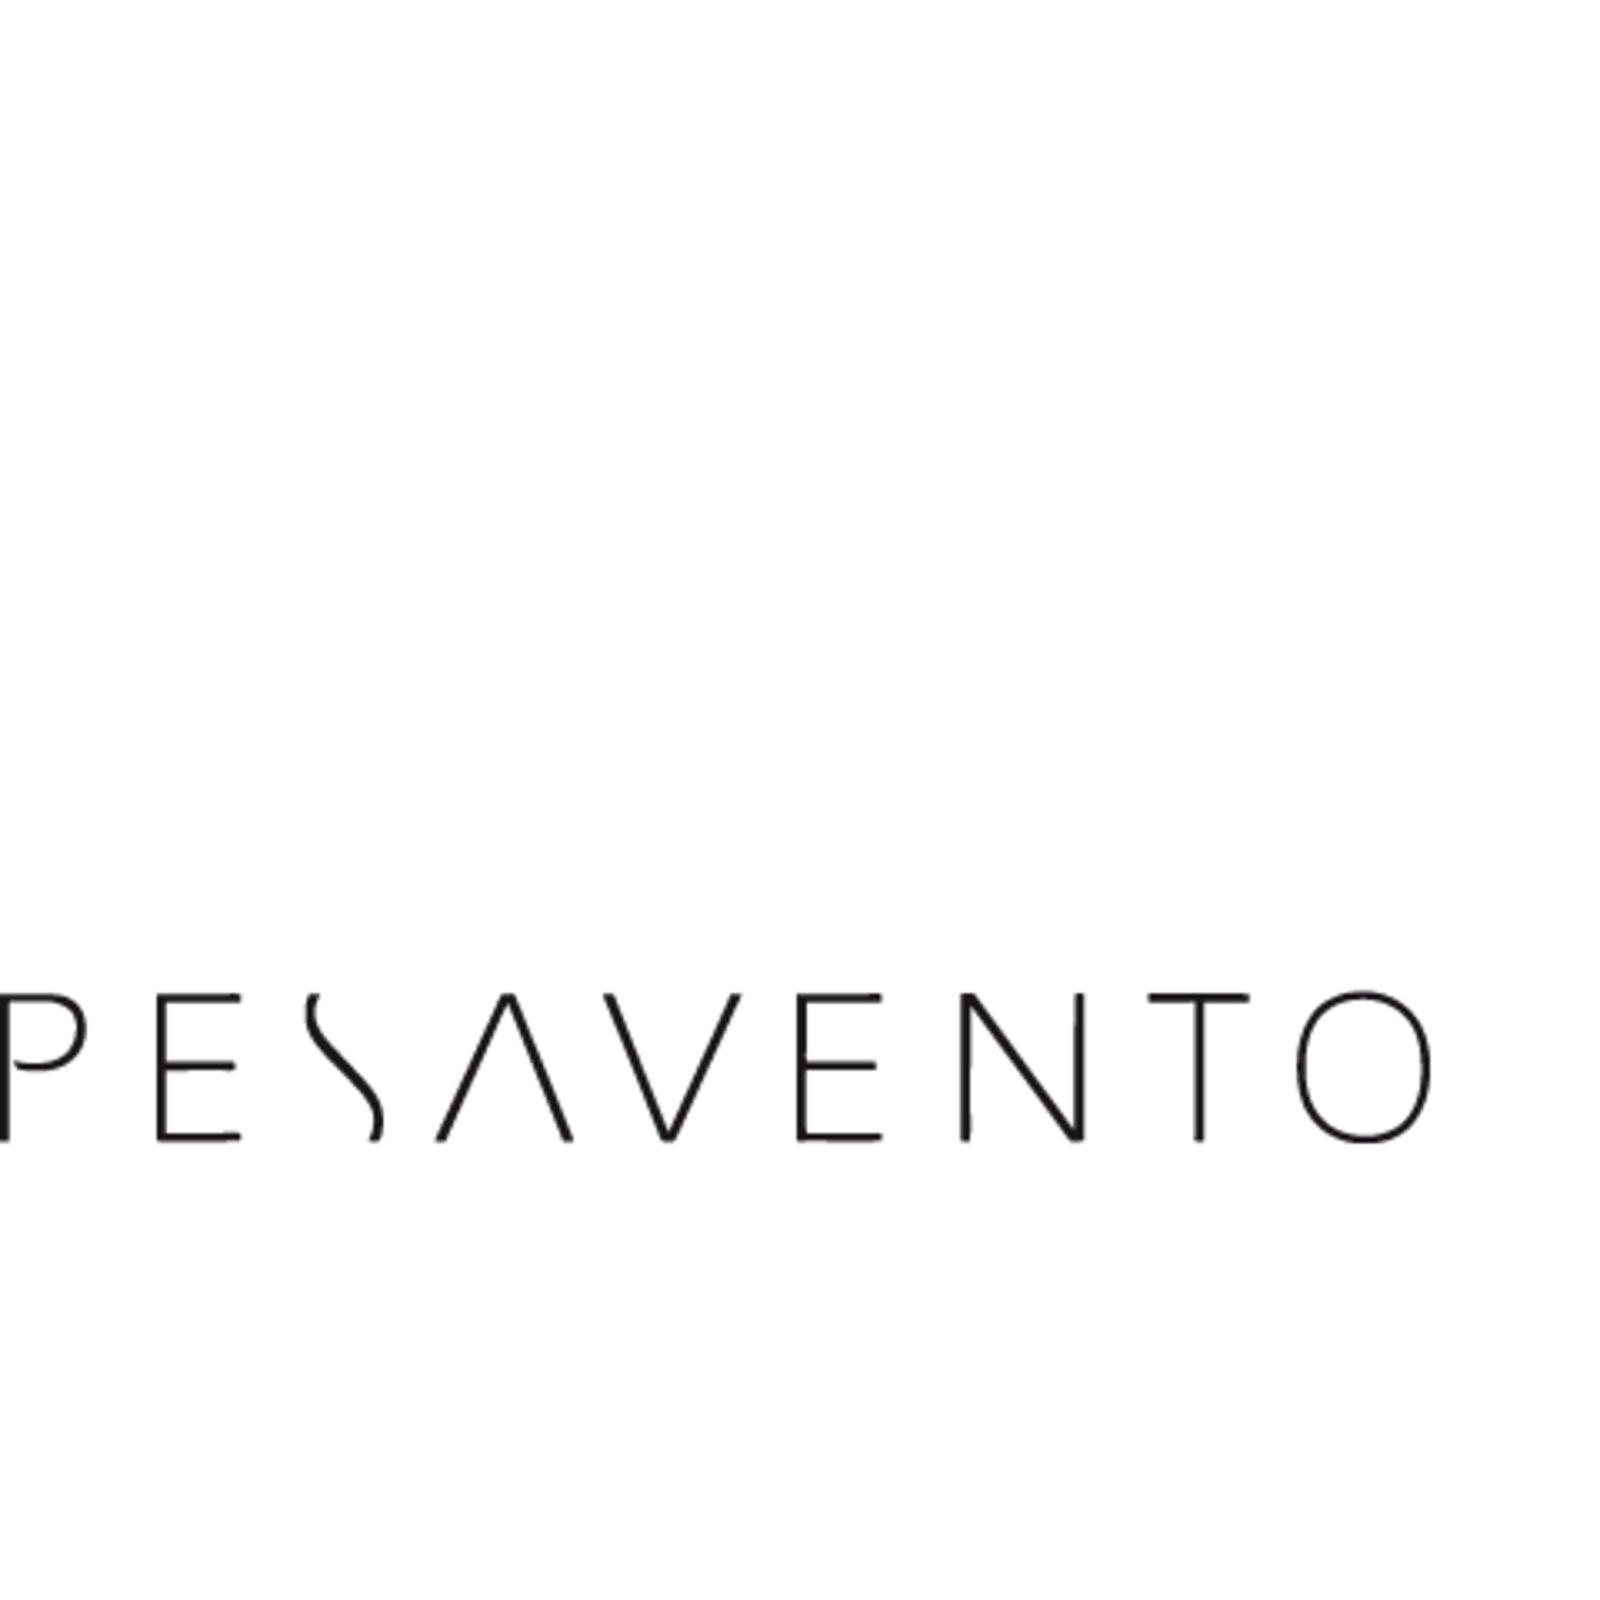 PESAVENTO